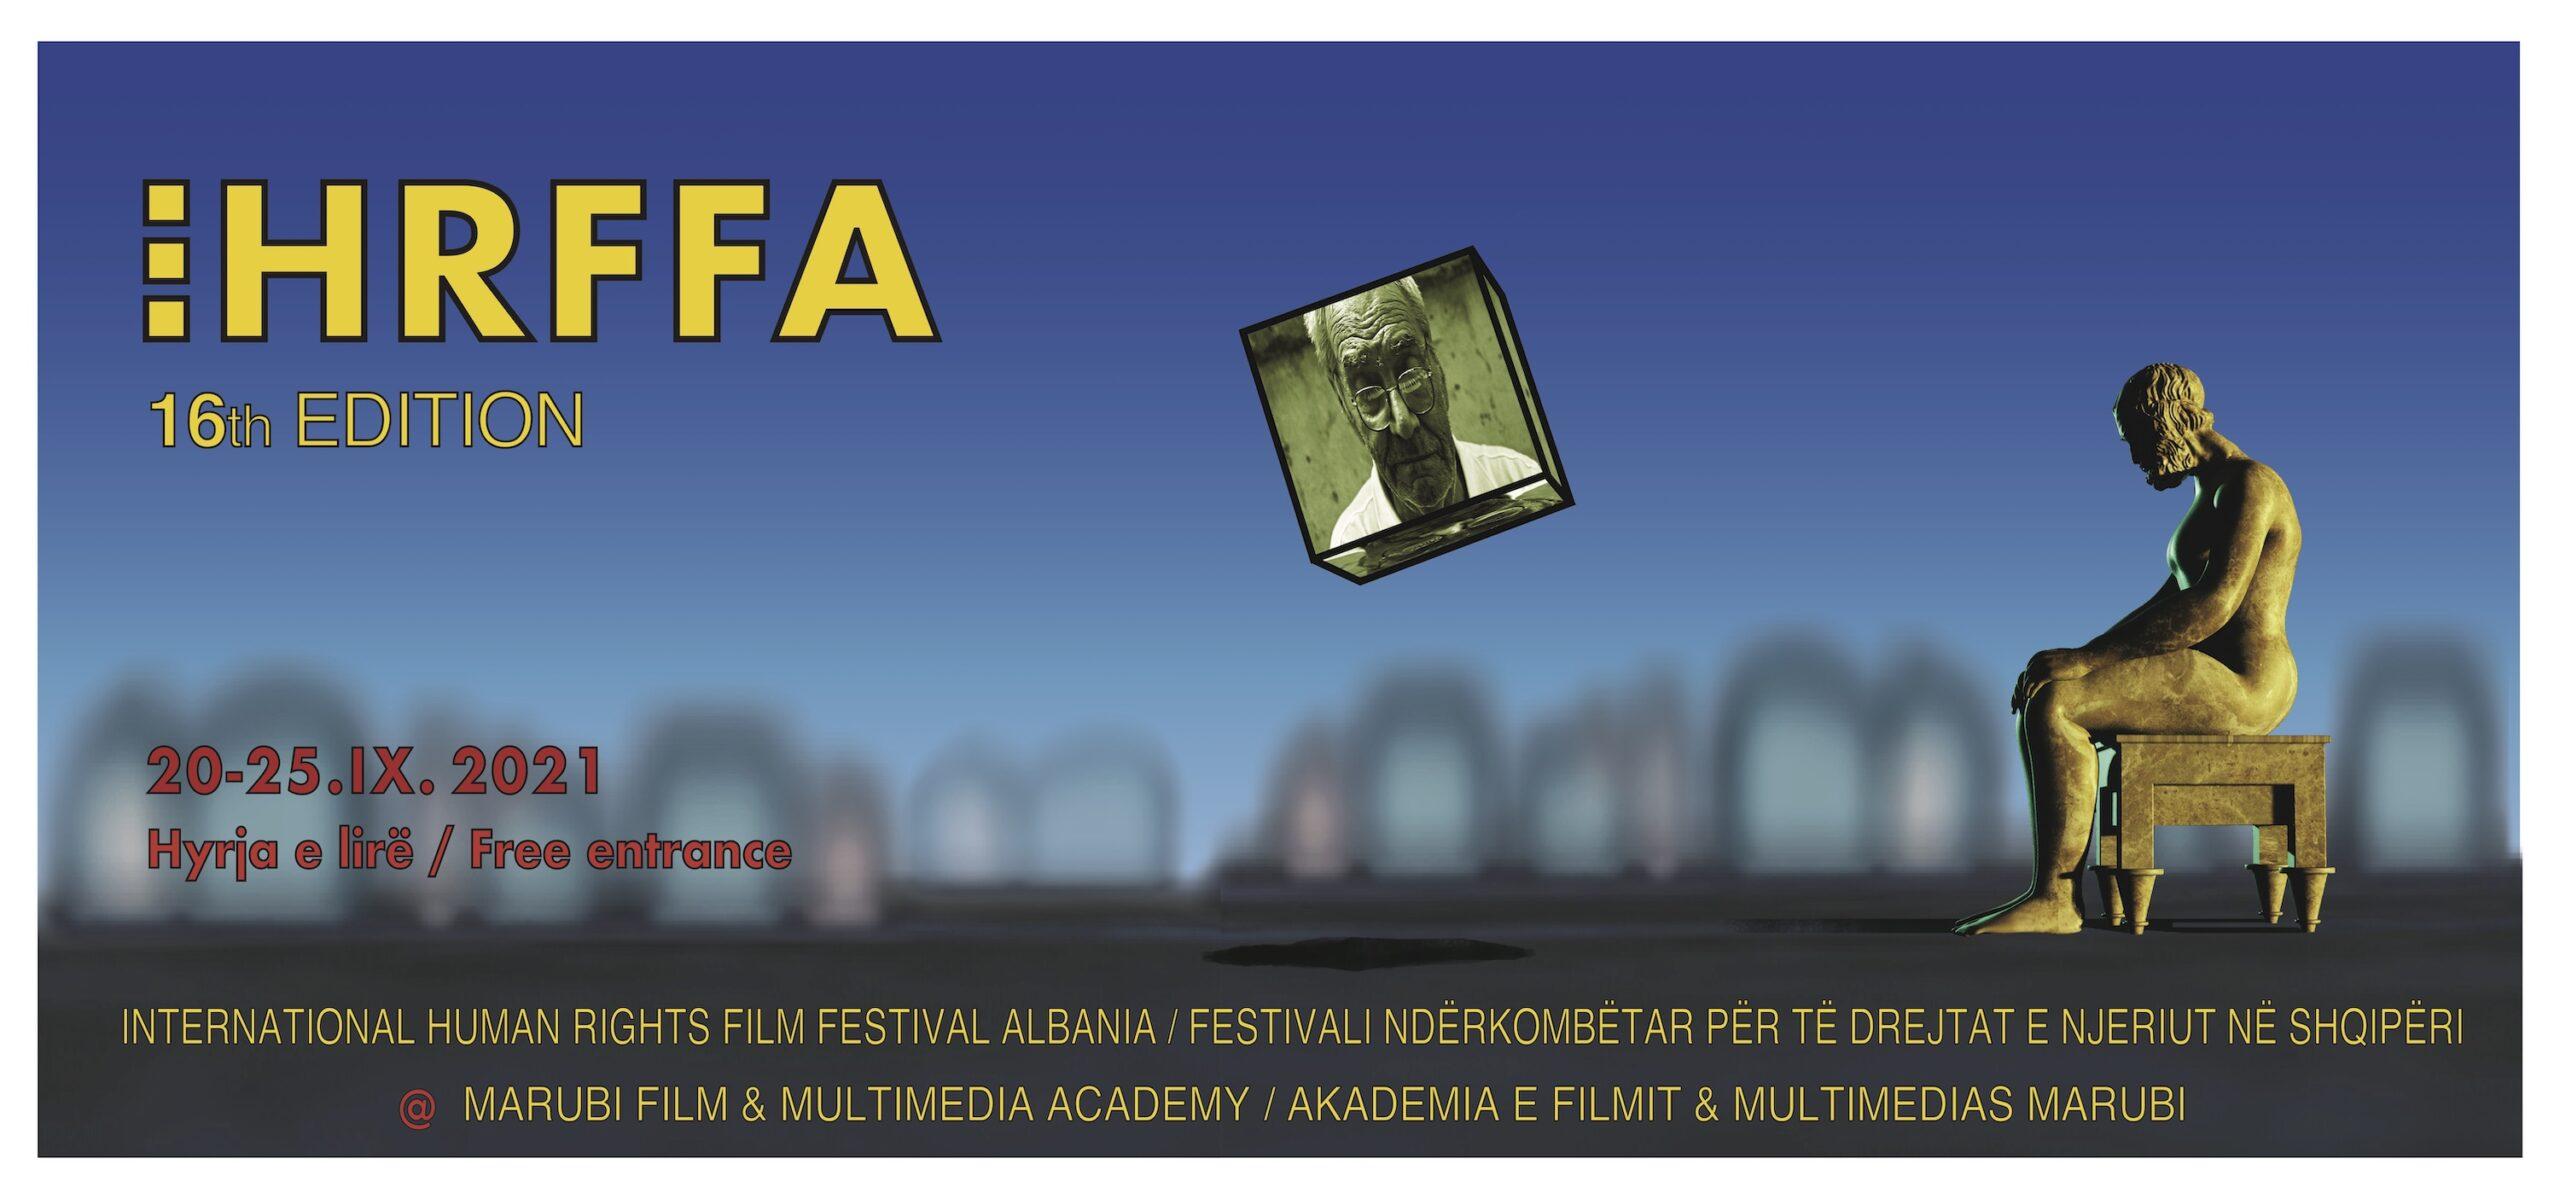 International Human Rights Film Festival Albania 2021